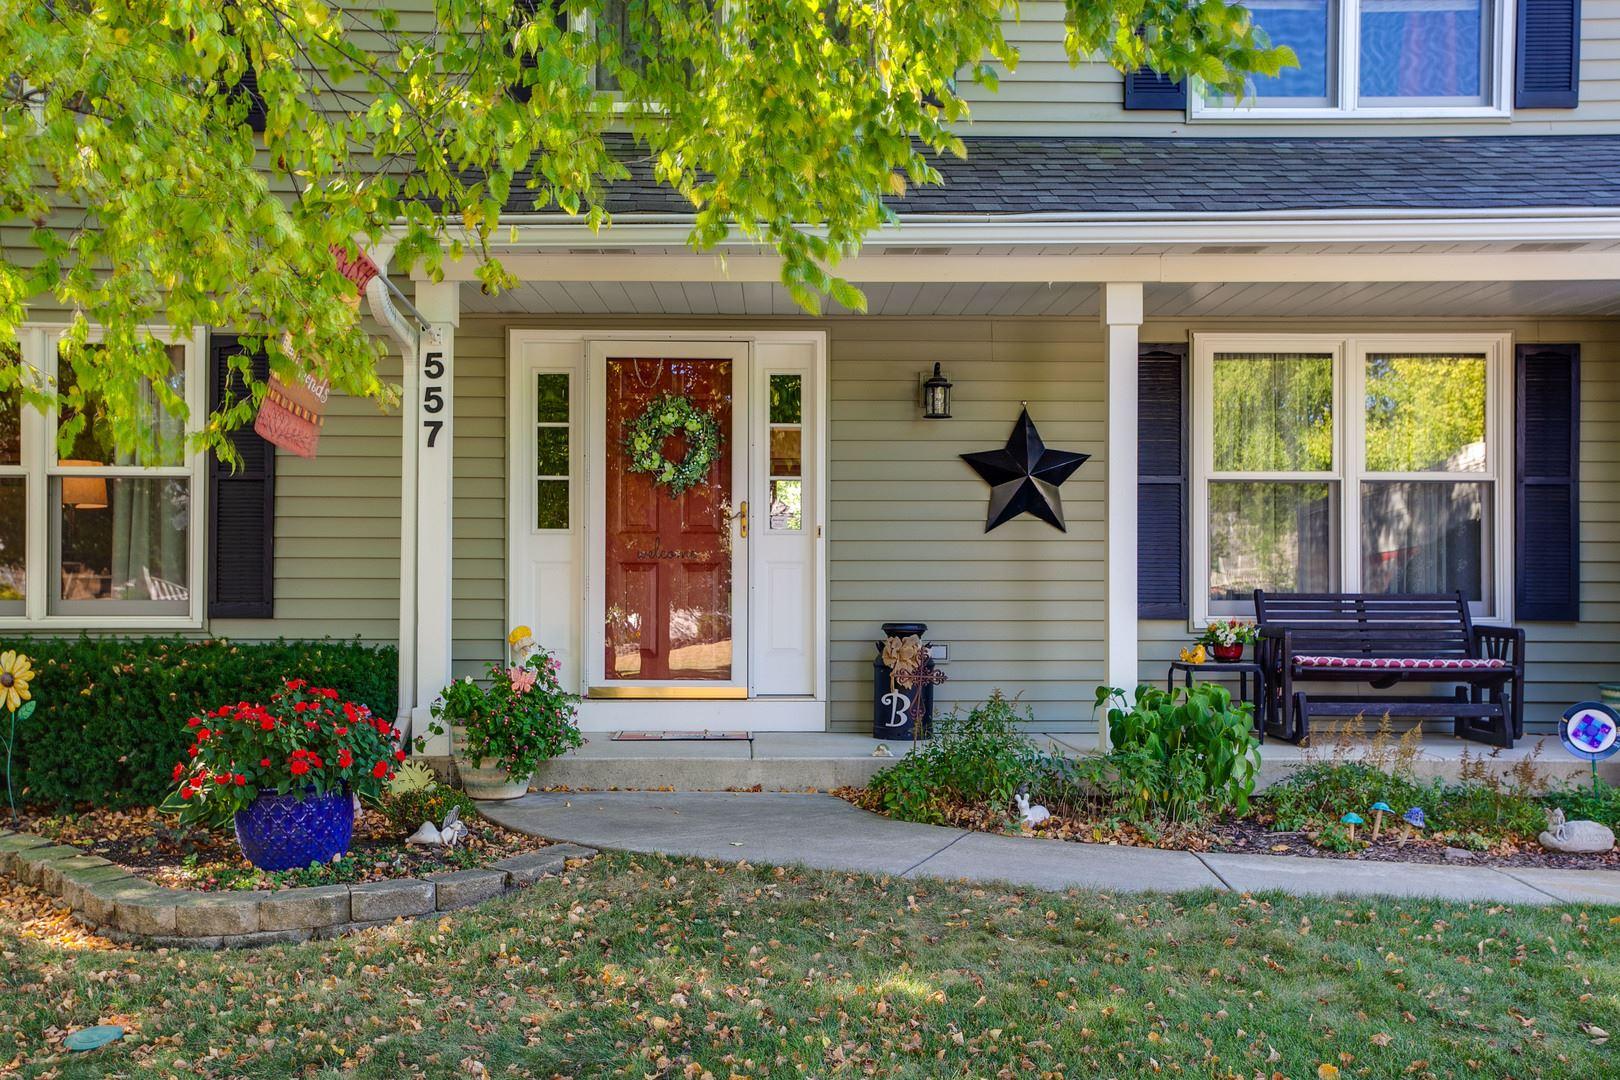 Photo of 557 Lavina Drive, Bolingbrook, IL 60440 (MLS # 10915709)